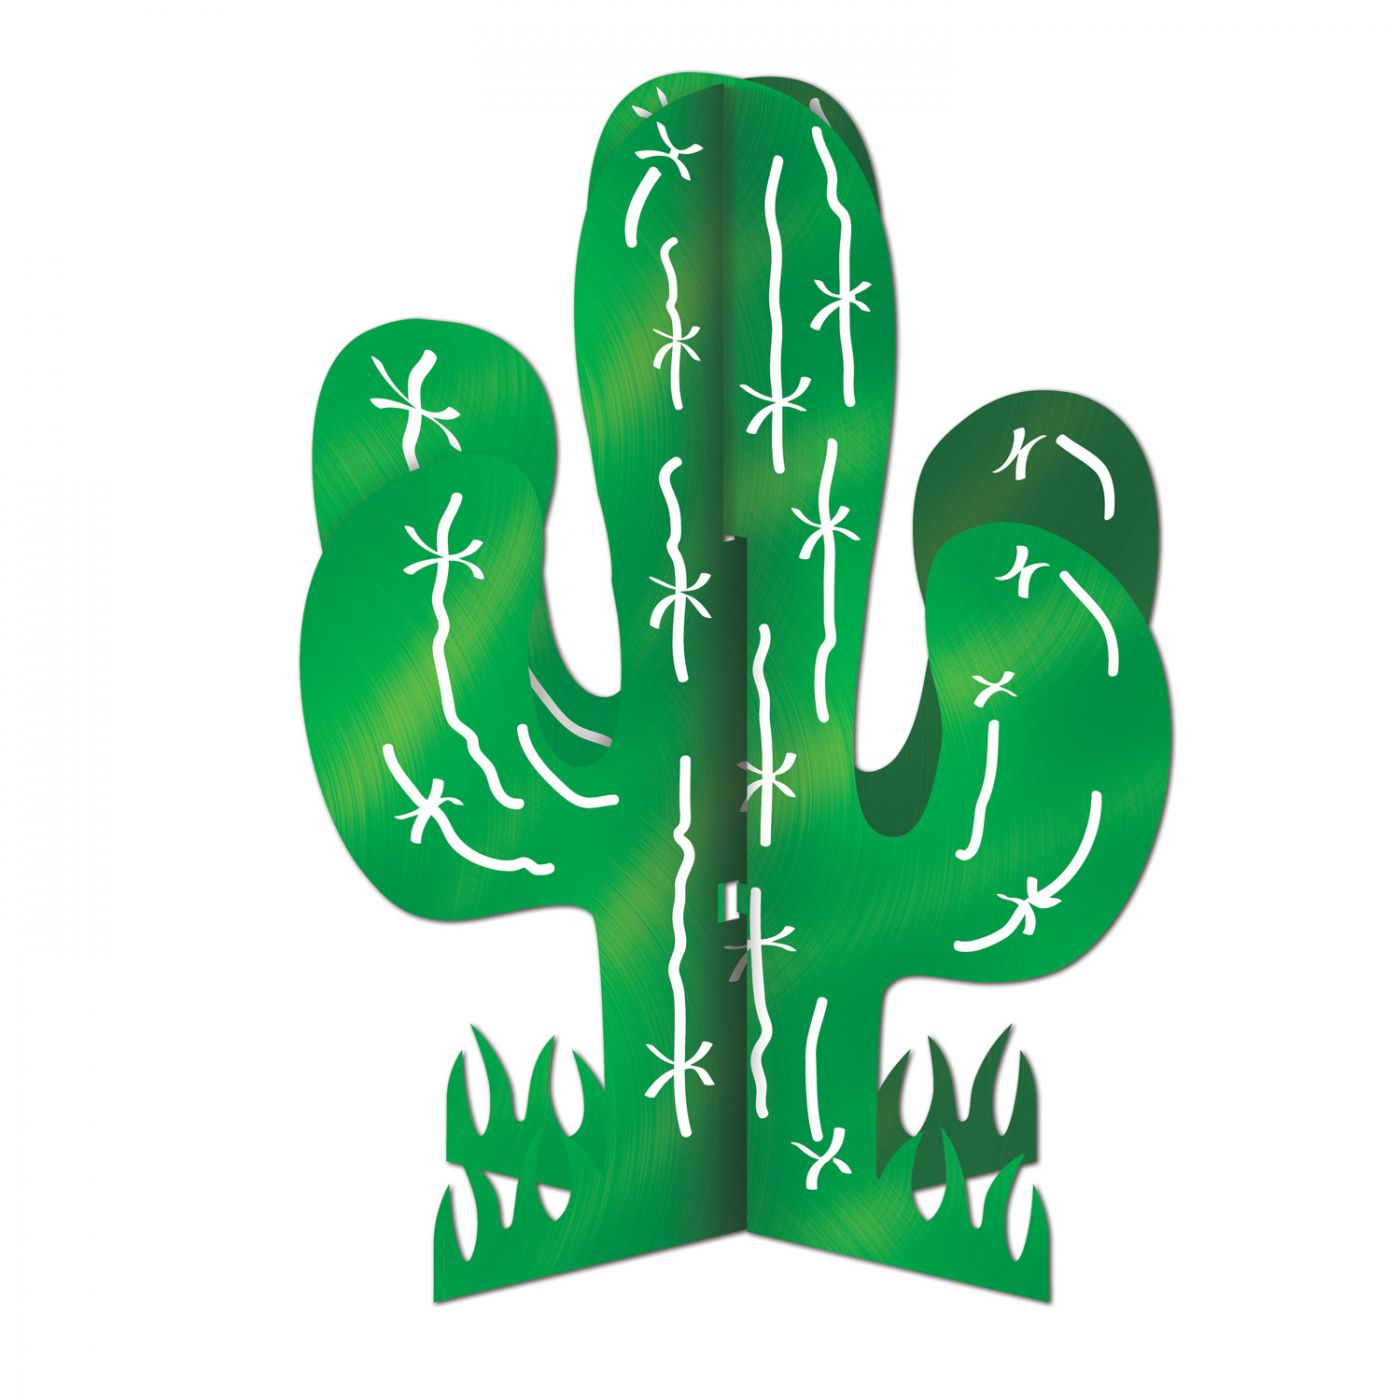 Image of 3-D Cactus Centerpiece